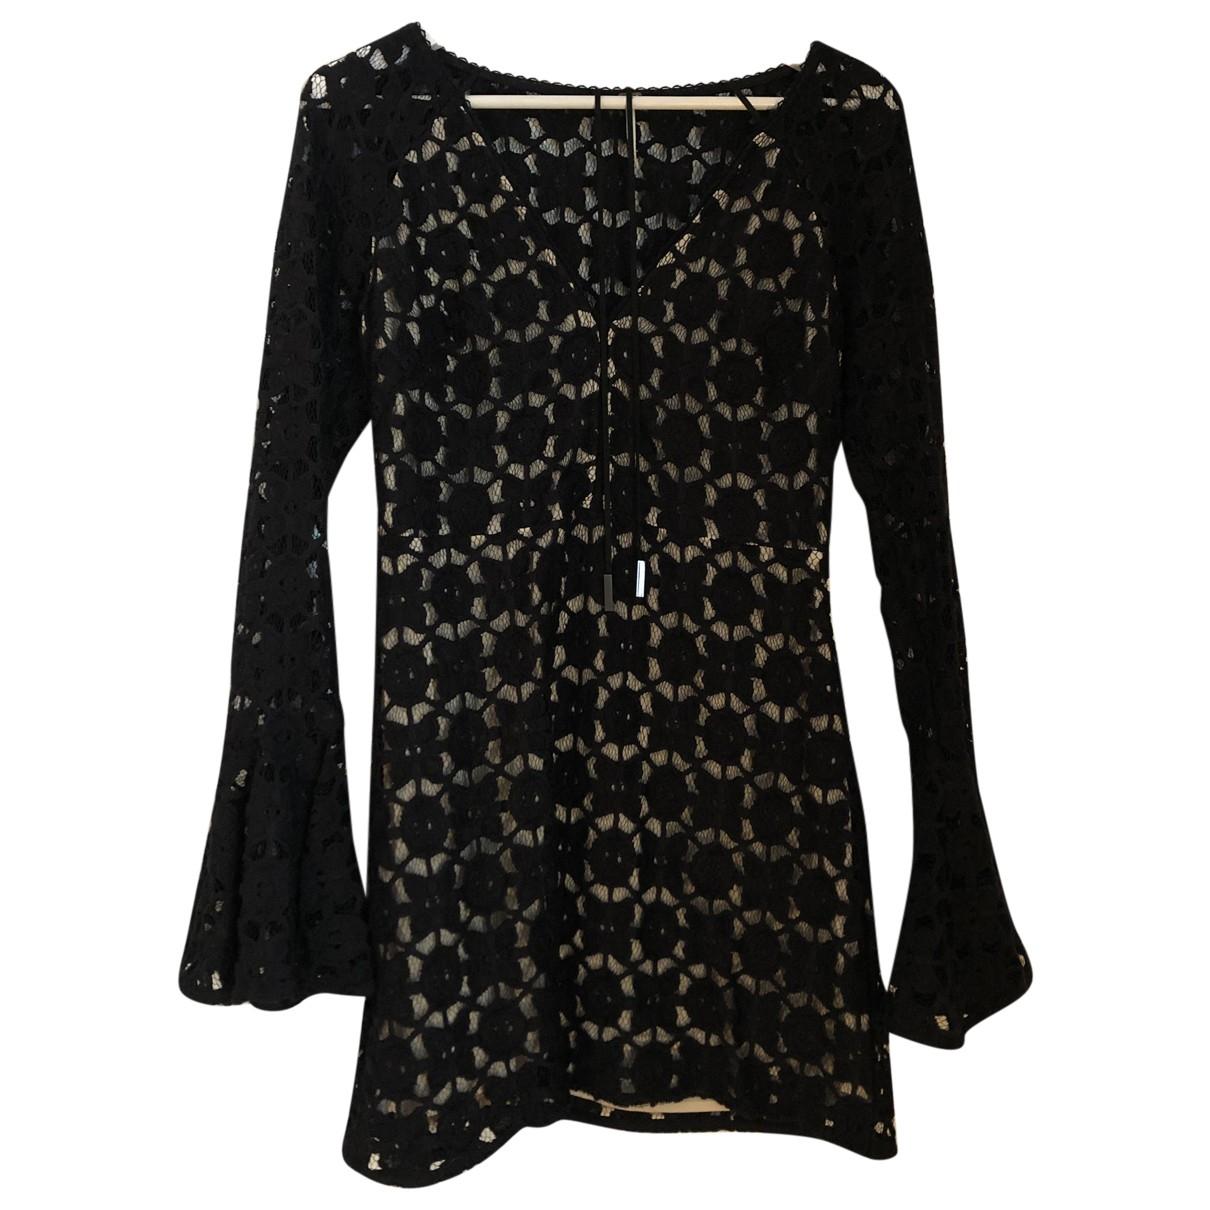 Free People \N Black Cotton dress for Women S International